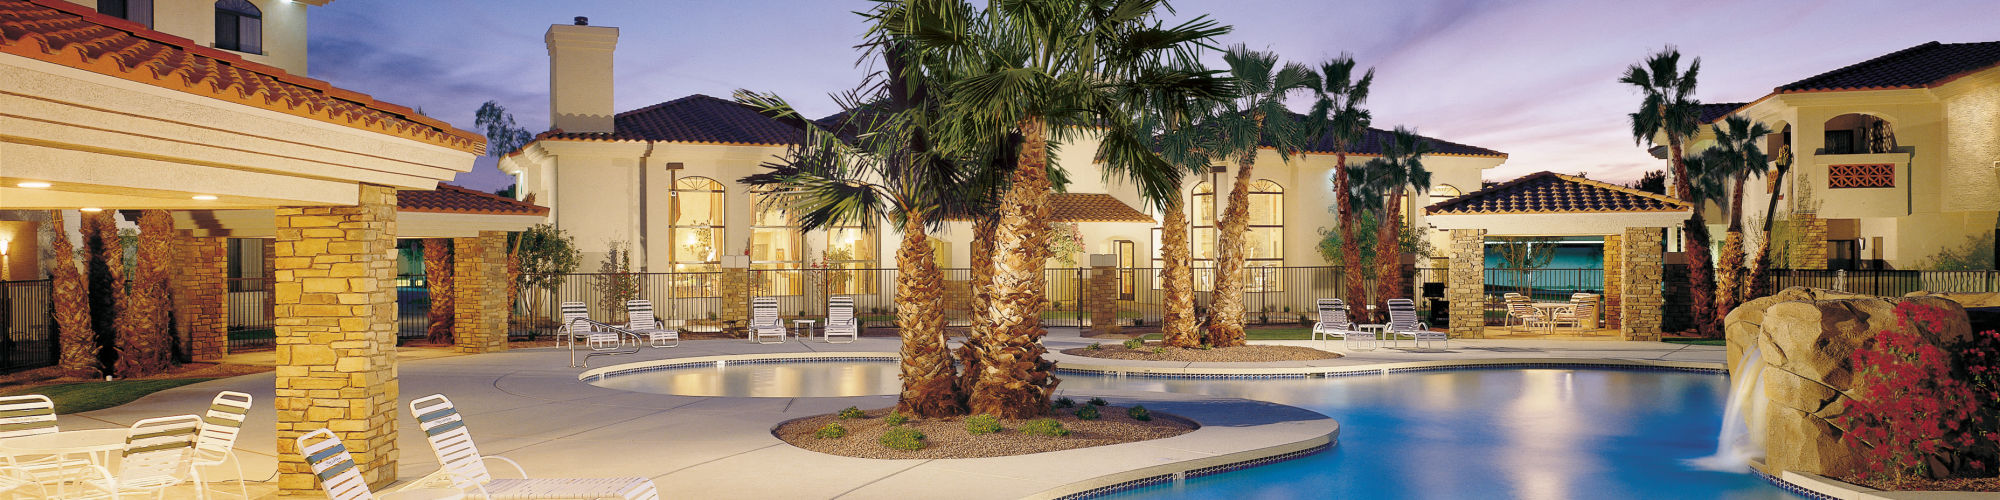 Apply to live at San Marbeya in Tempe, Arizona